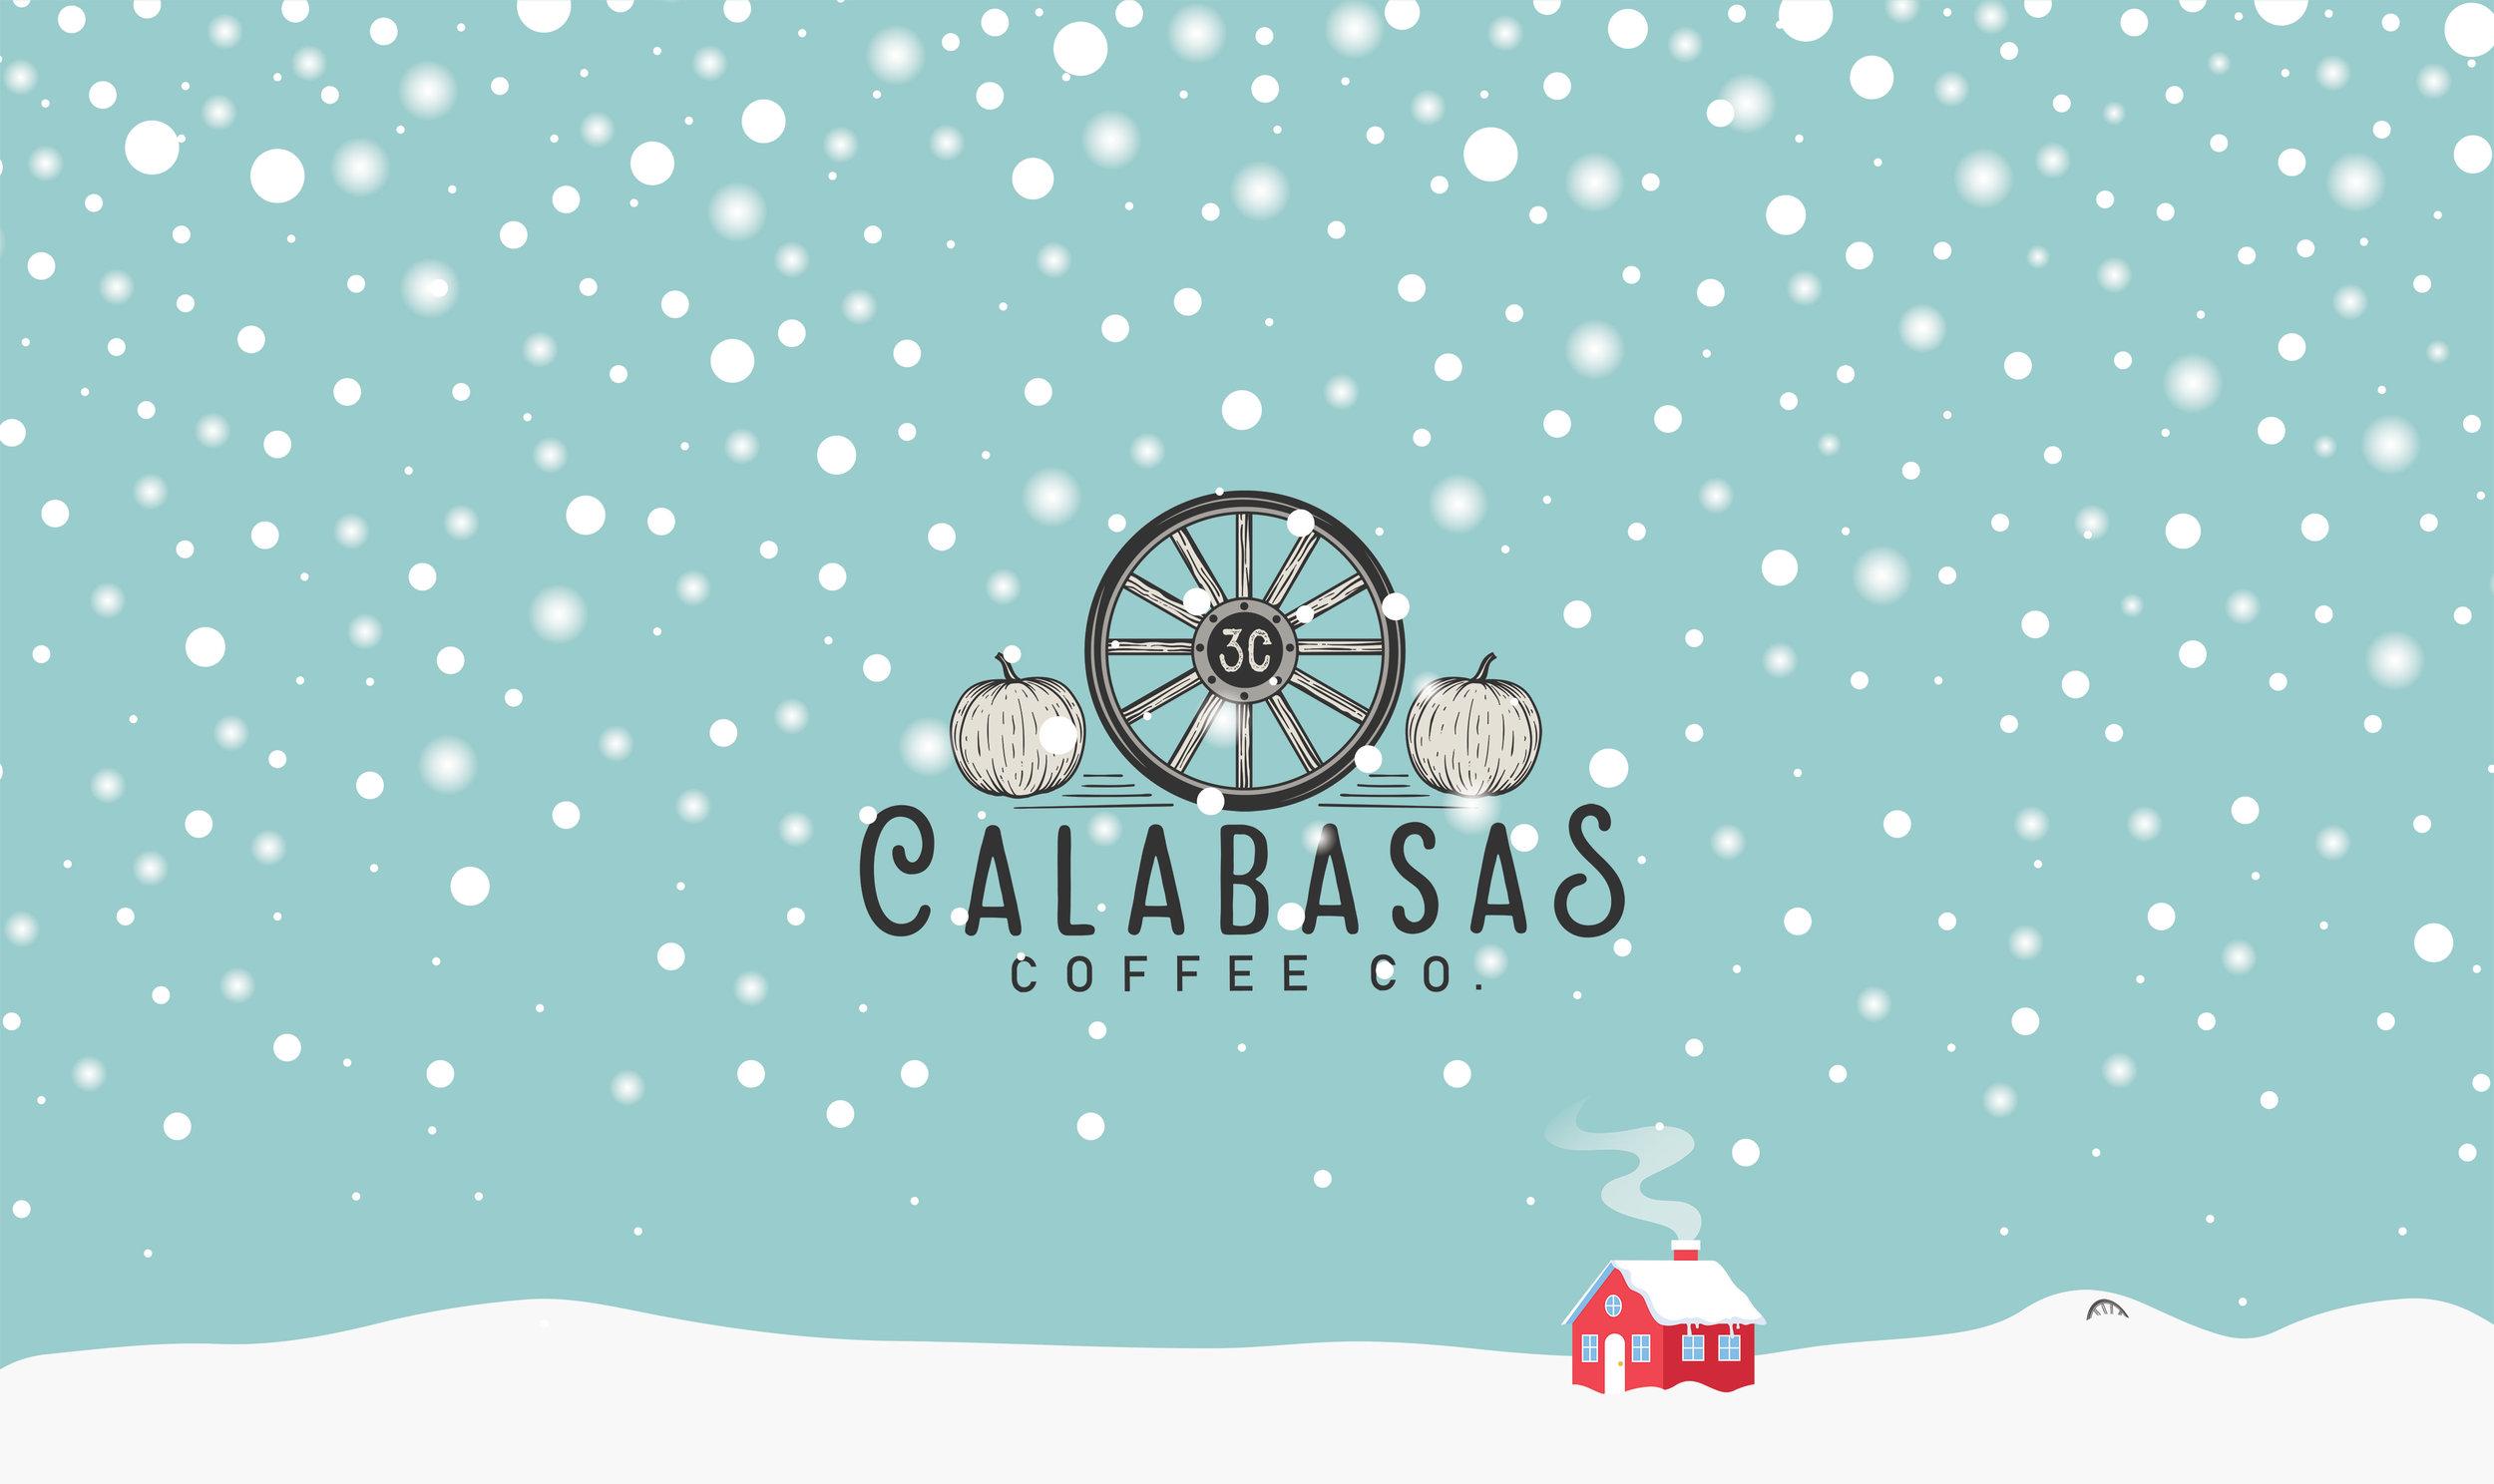 Calabasas-Coffee-Winter-2018-19-Wallpaper-Web.jpg